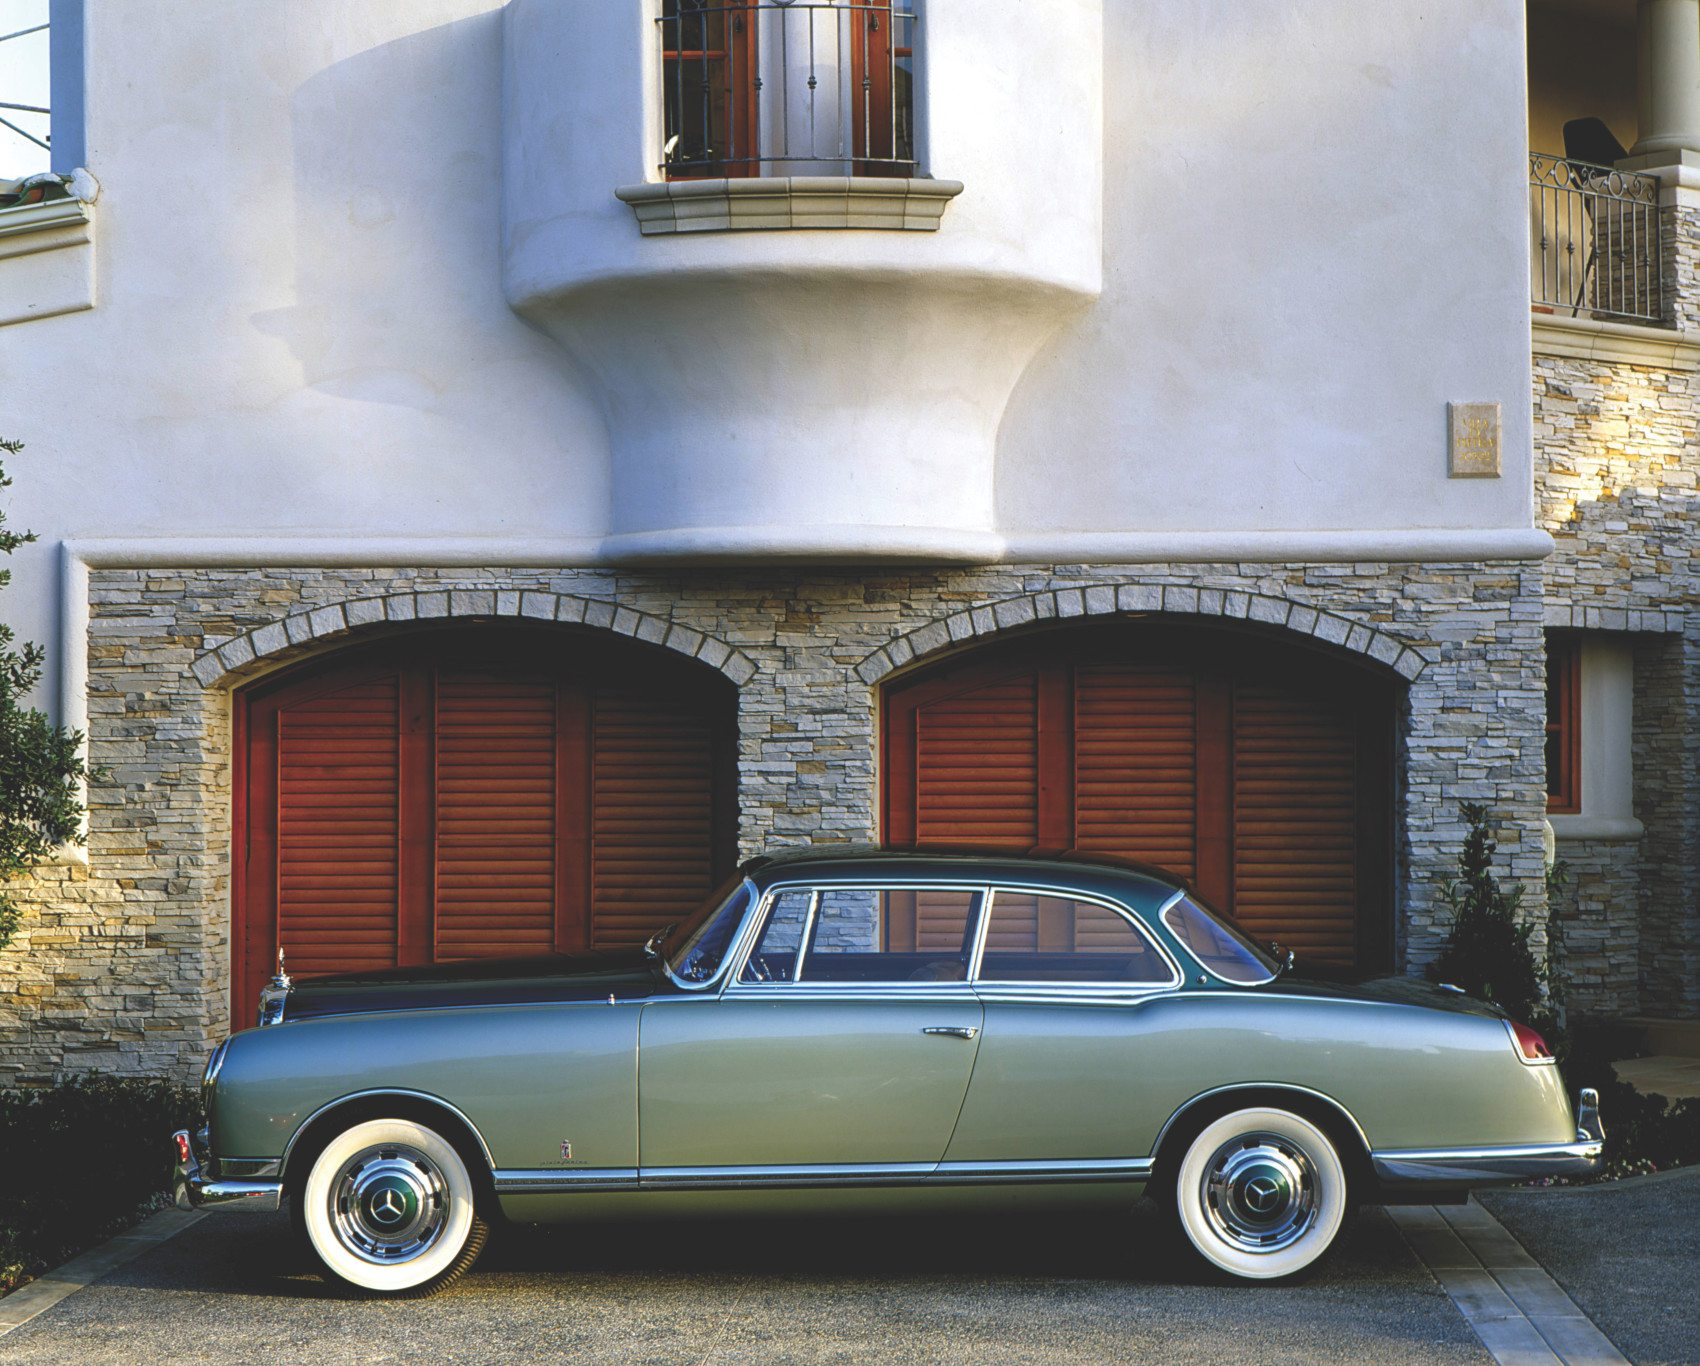 1955 Mercede-Benz 300B Pininfarina Coupe